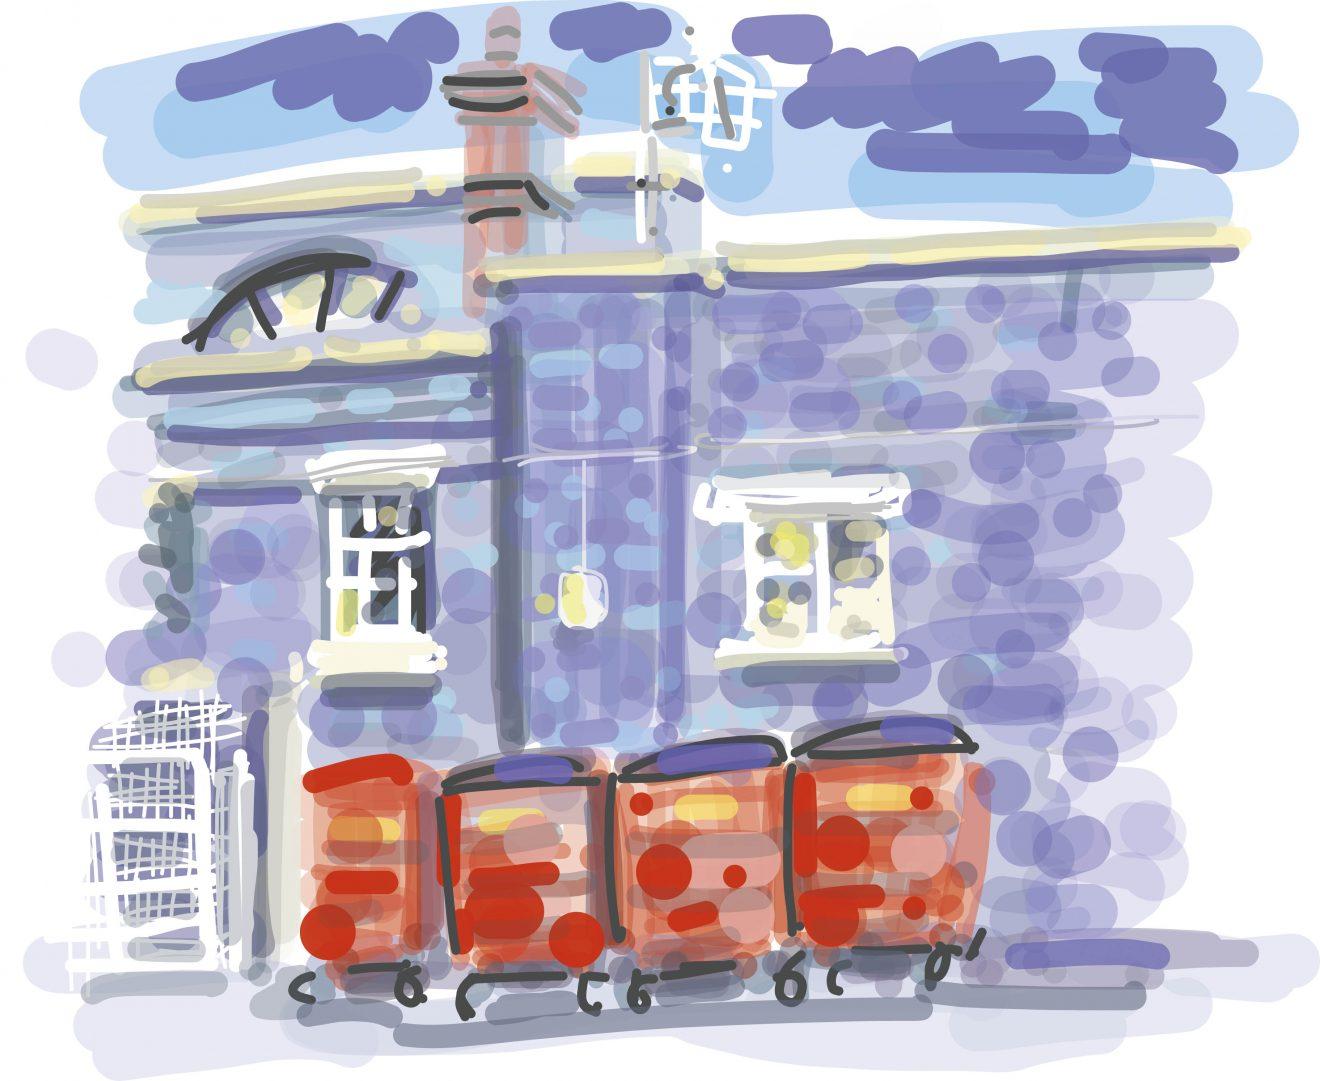 Worcester-Shrub-Hill-Station